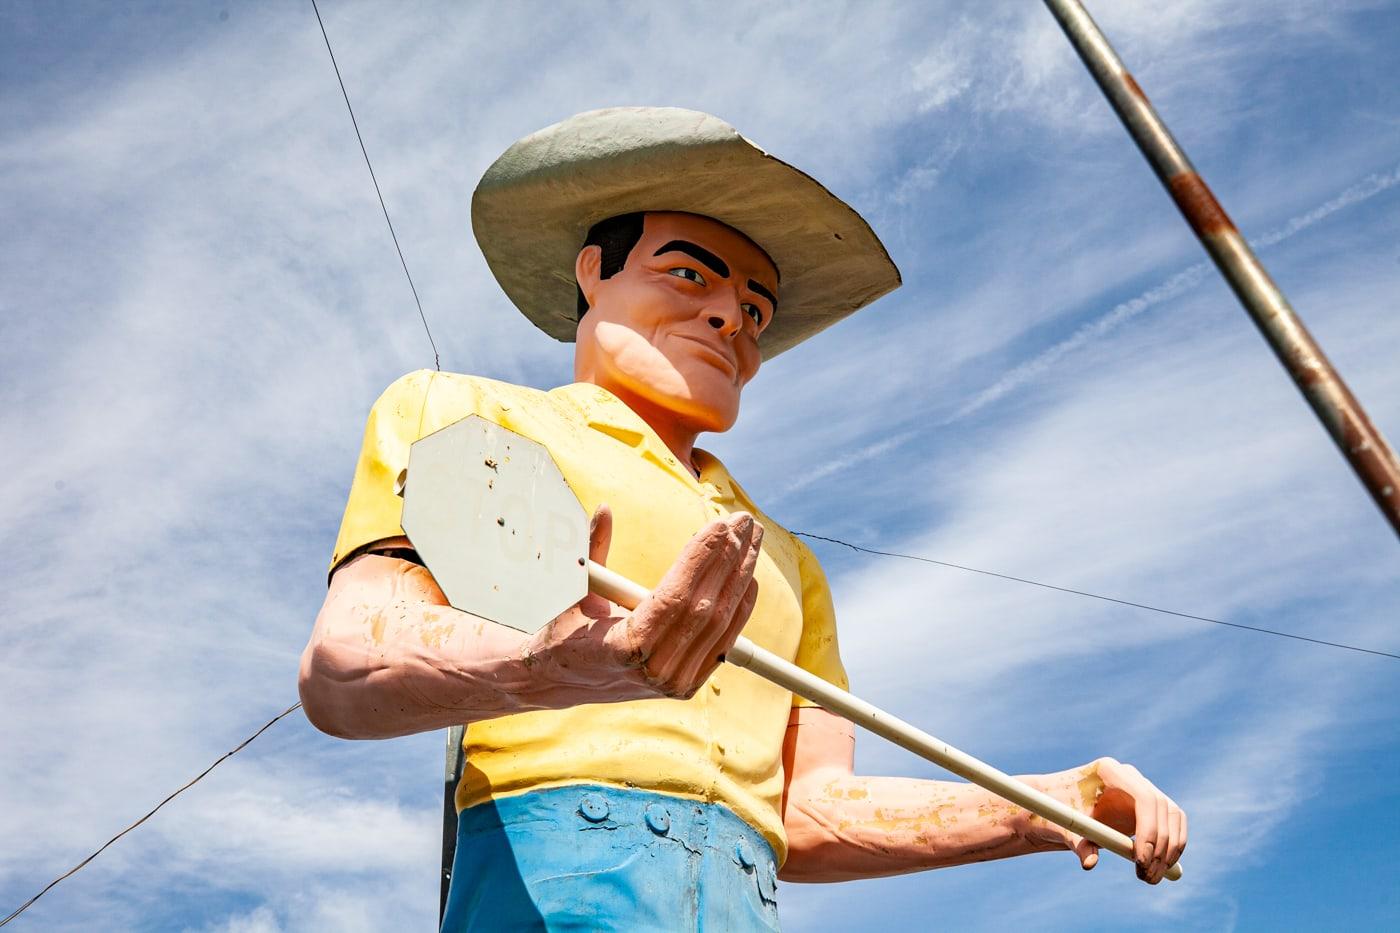 Cowboy Muffler Man in Wendell, Idaho